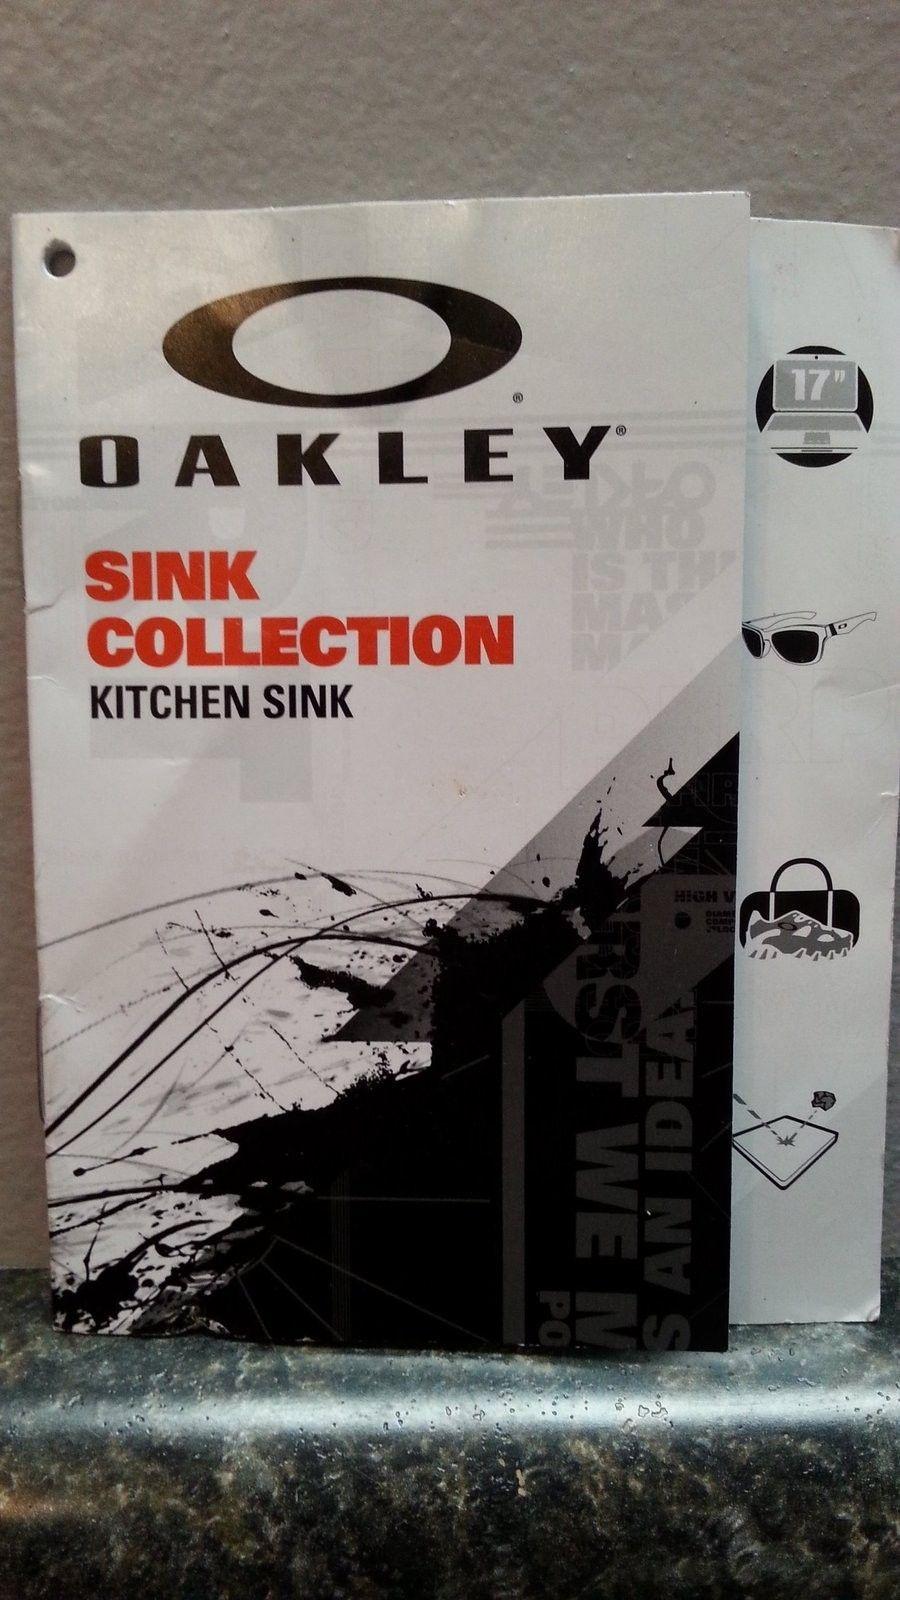 Oakley Kitchen Sink FS - uploadfromtaptalk1427411326940.jpg